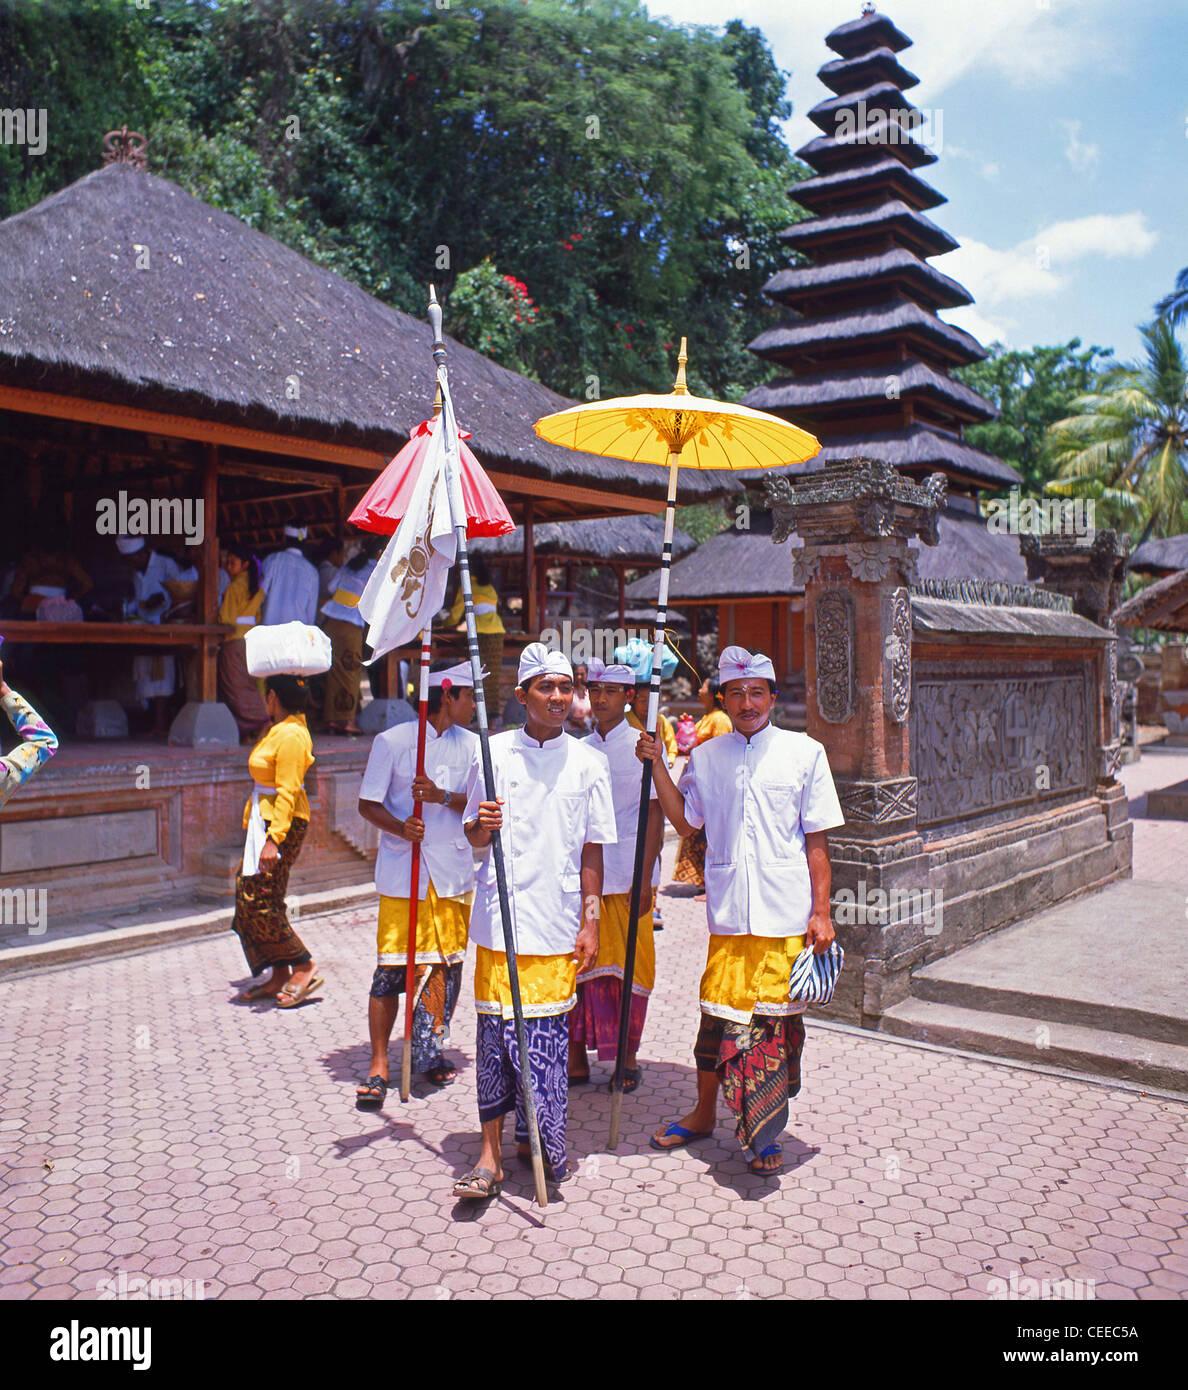 Procession in Temple of The Bats, Goa Lawah, Bali, Bali Province, Lesser Sunda Islands, Indonesia - Stock Image